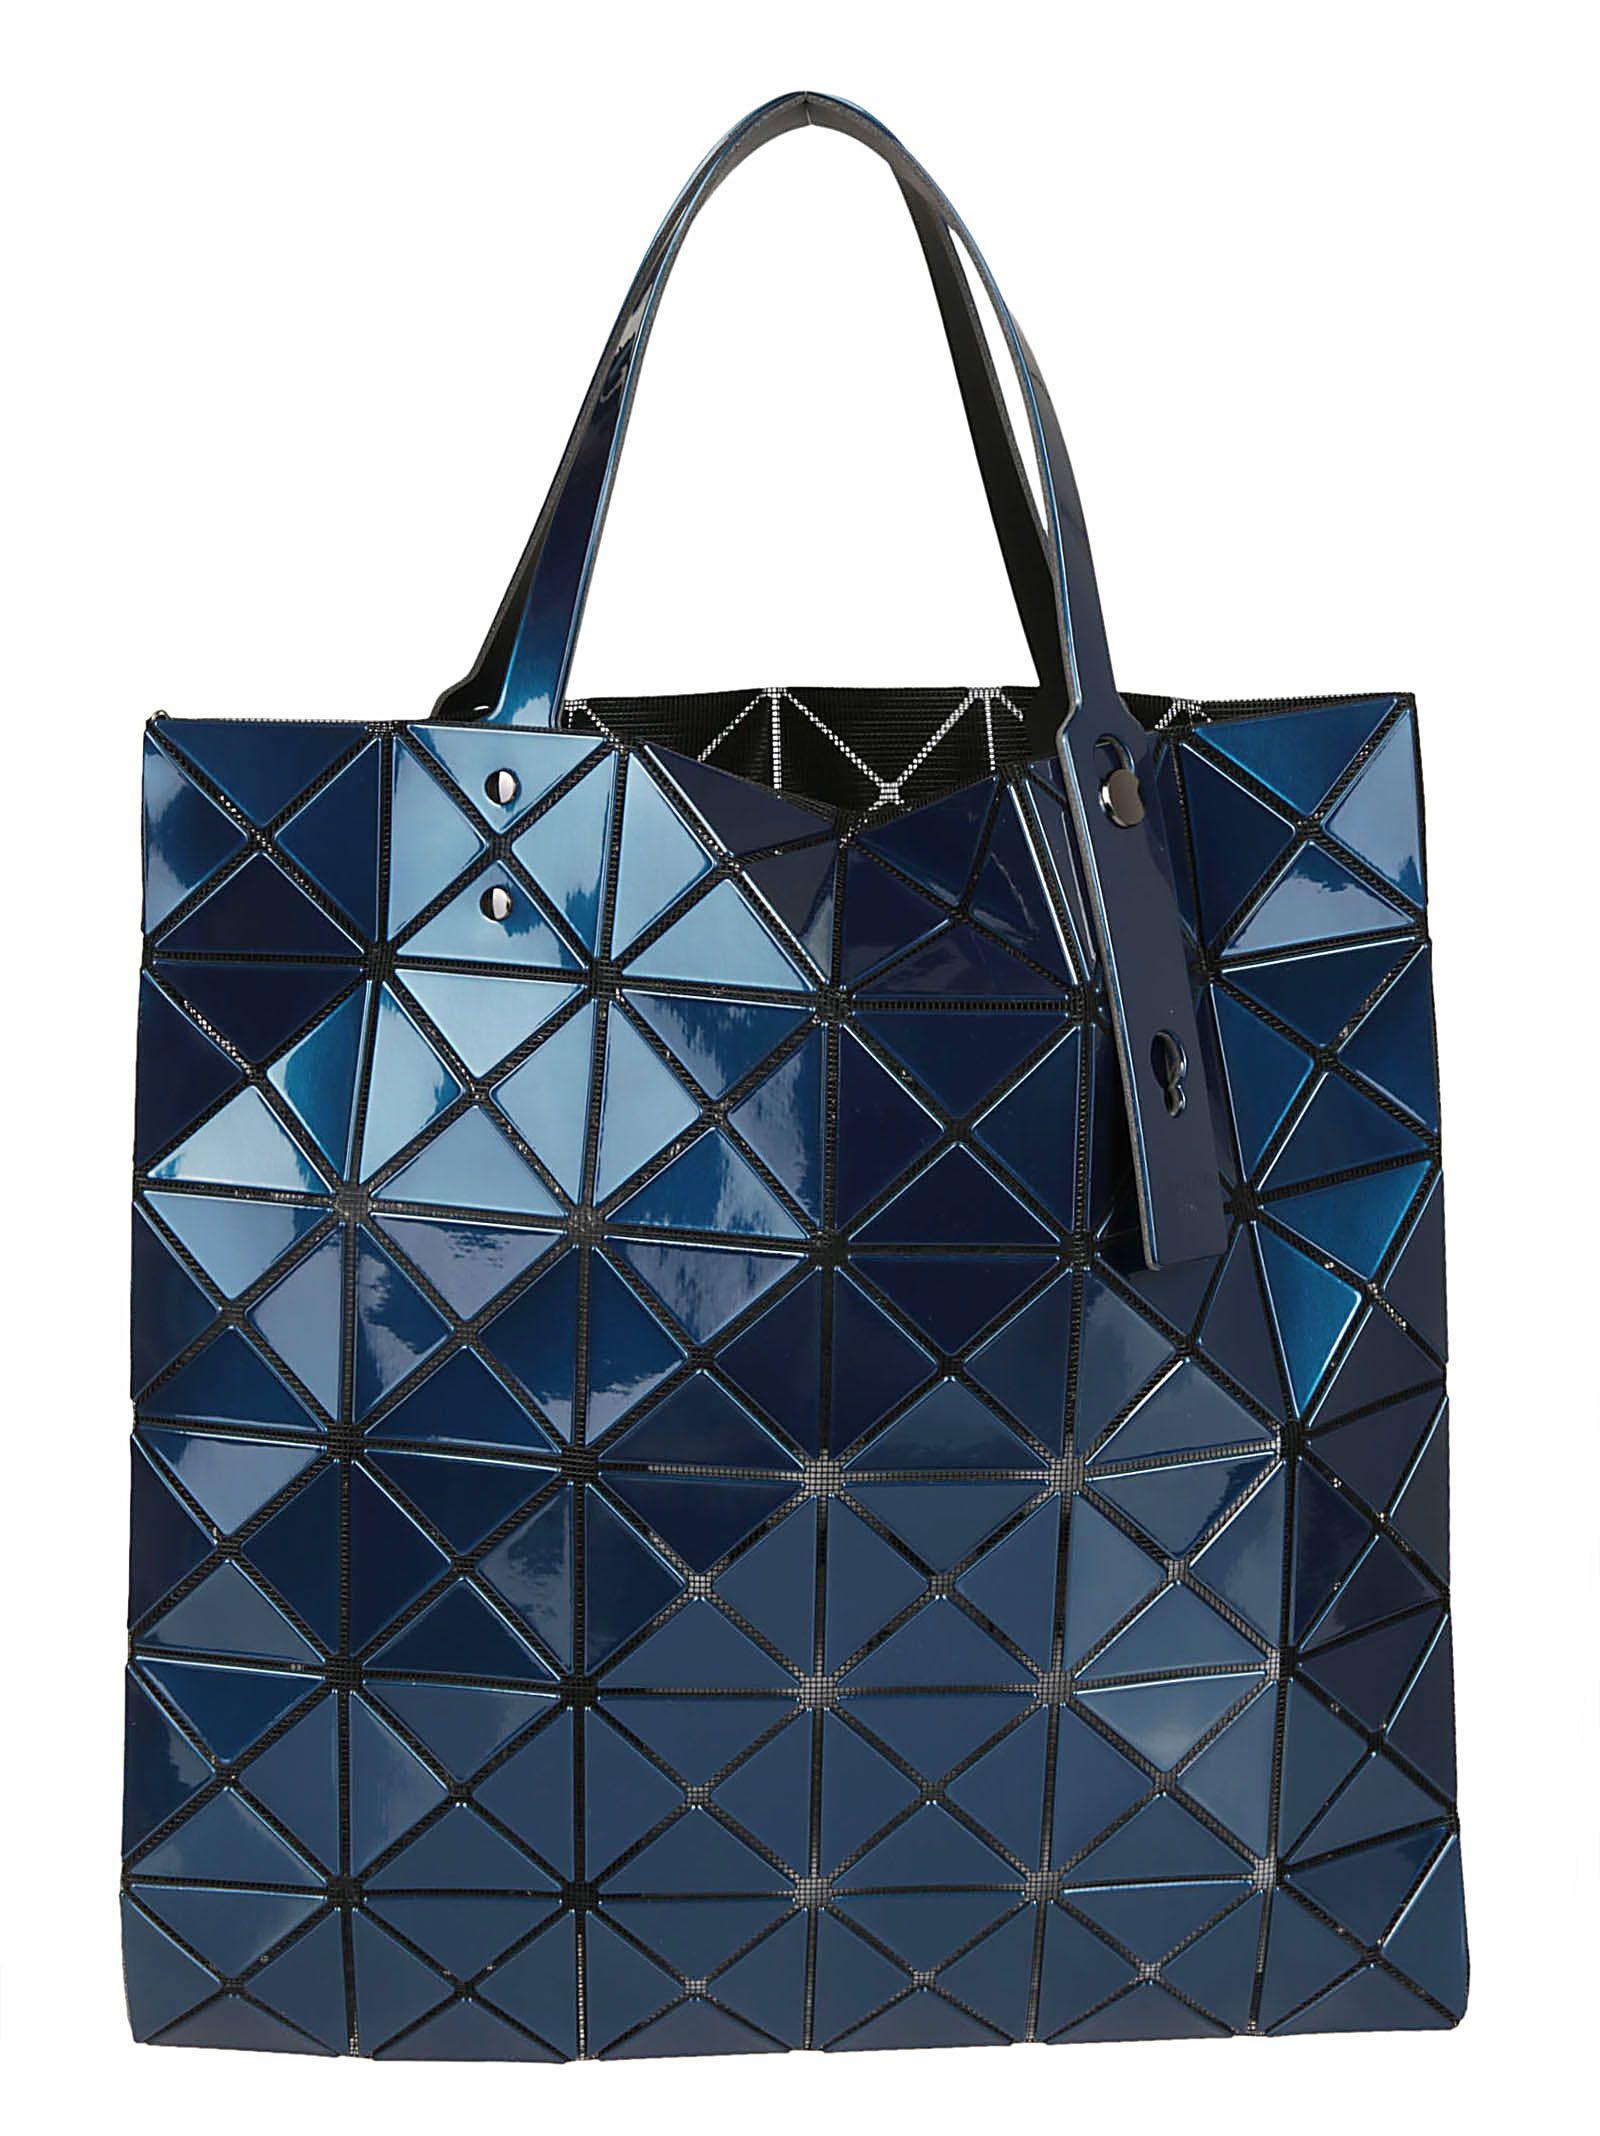 145225a1243b Bao Bao Issey Miyake Lucent Shopper Bag In Blue